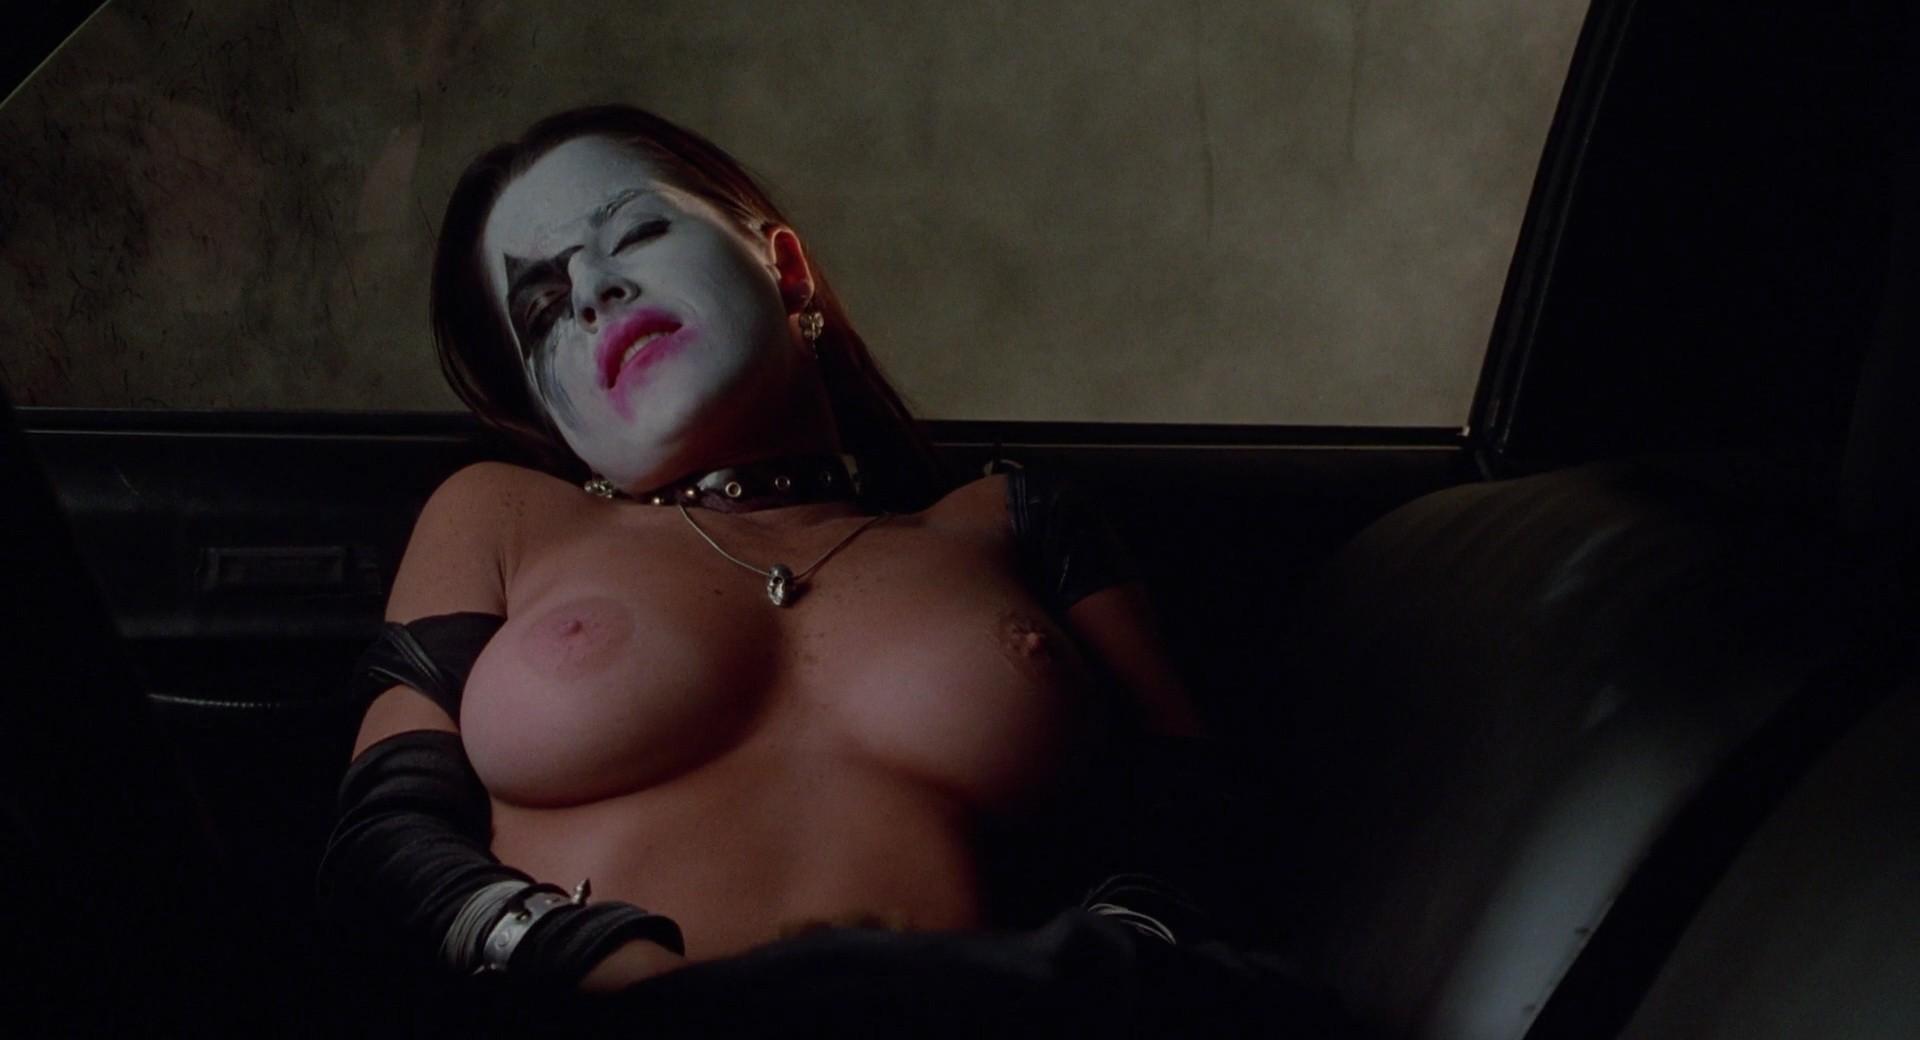 Helene zimmer best nude scenes q desire 2011 hd - 2 part 6